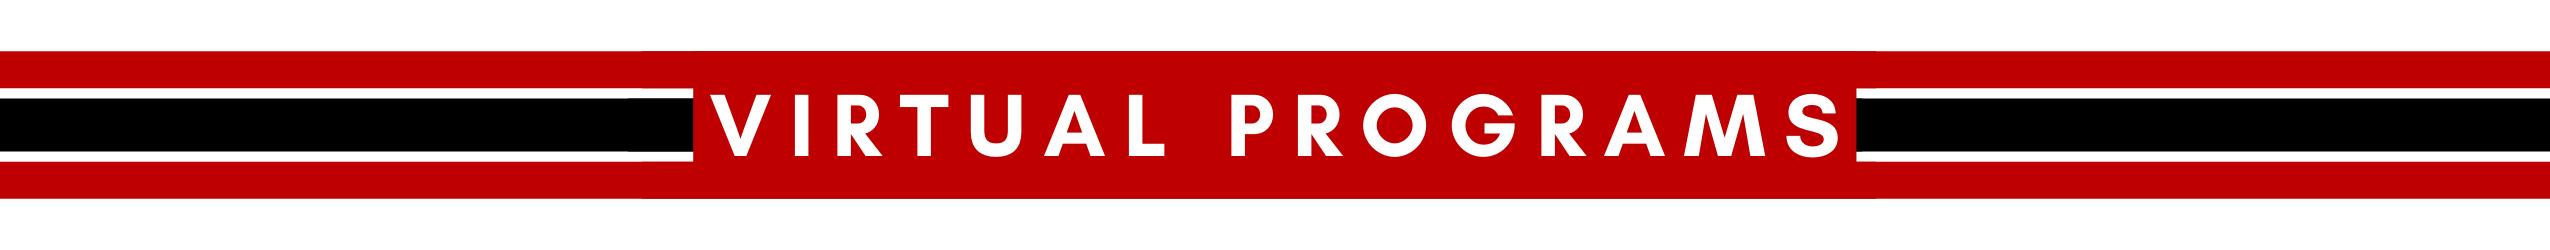 virtual programs banner